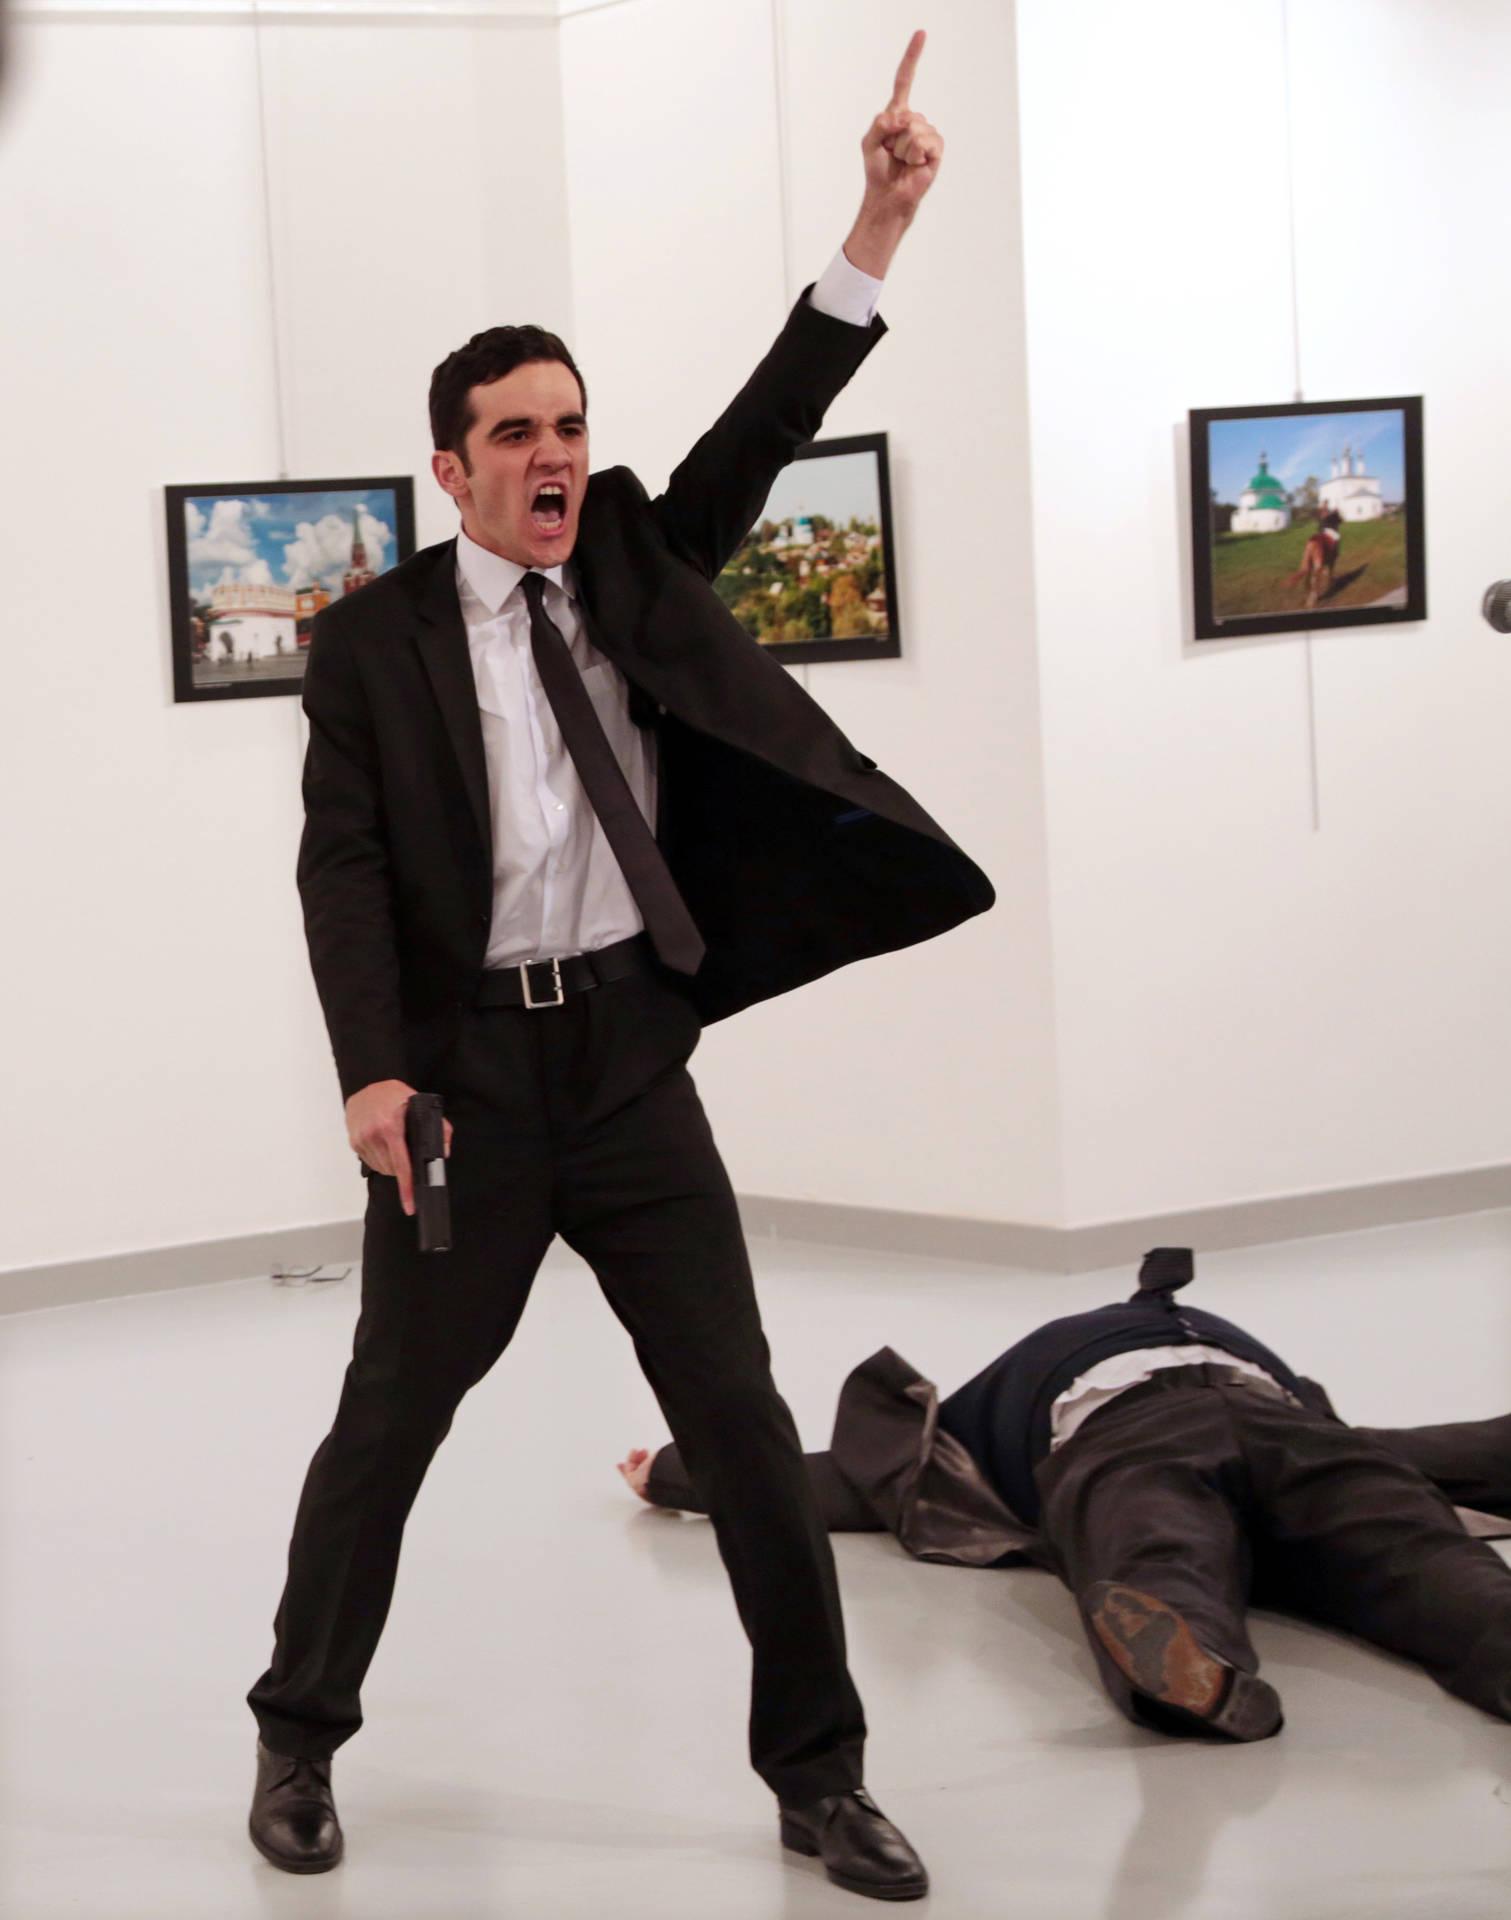 Bild: Burhan Oszbilici, The Associated Press (AP)